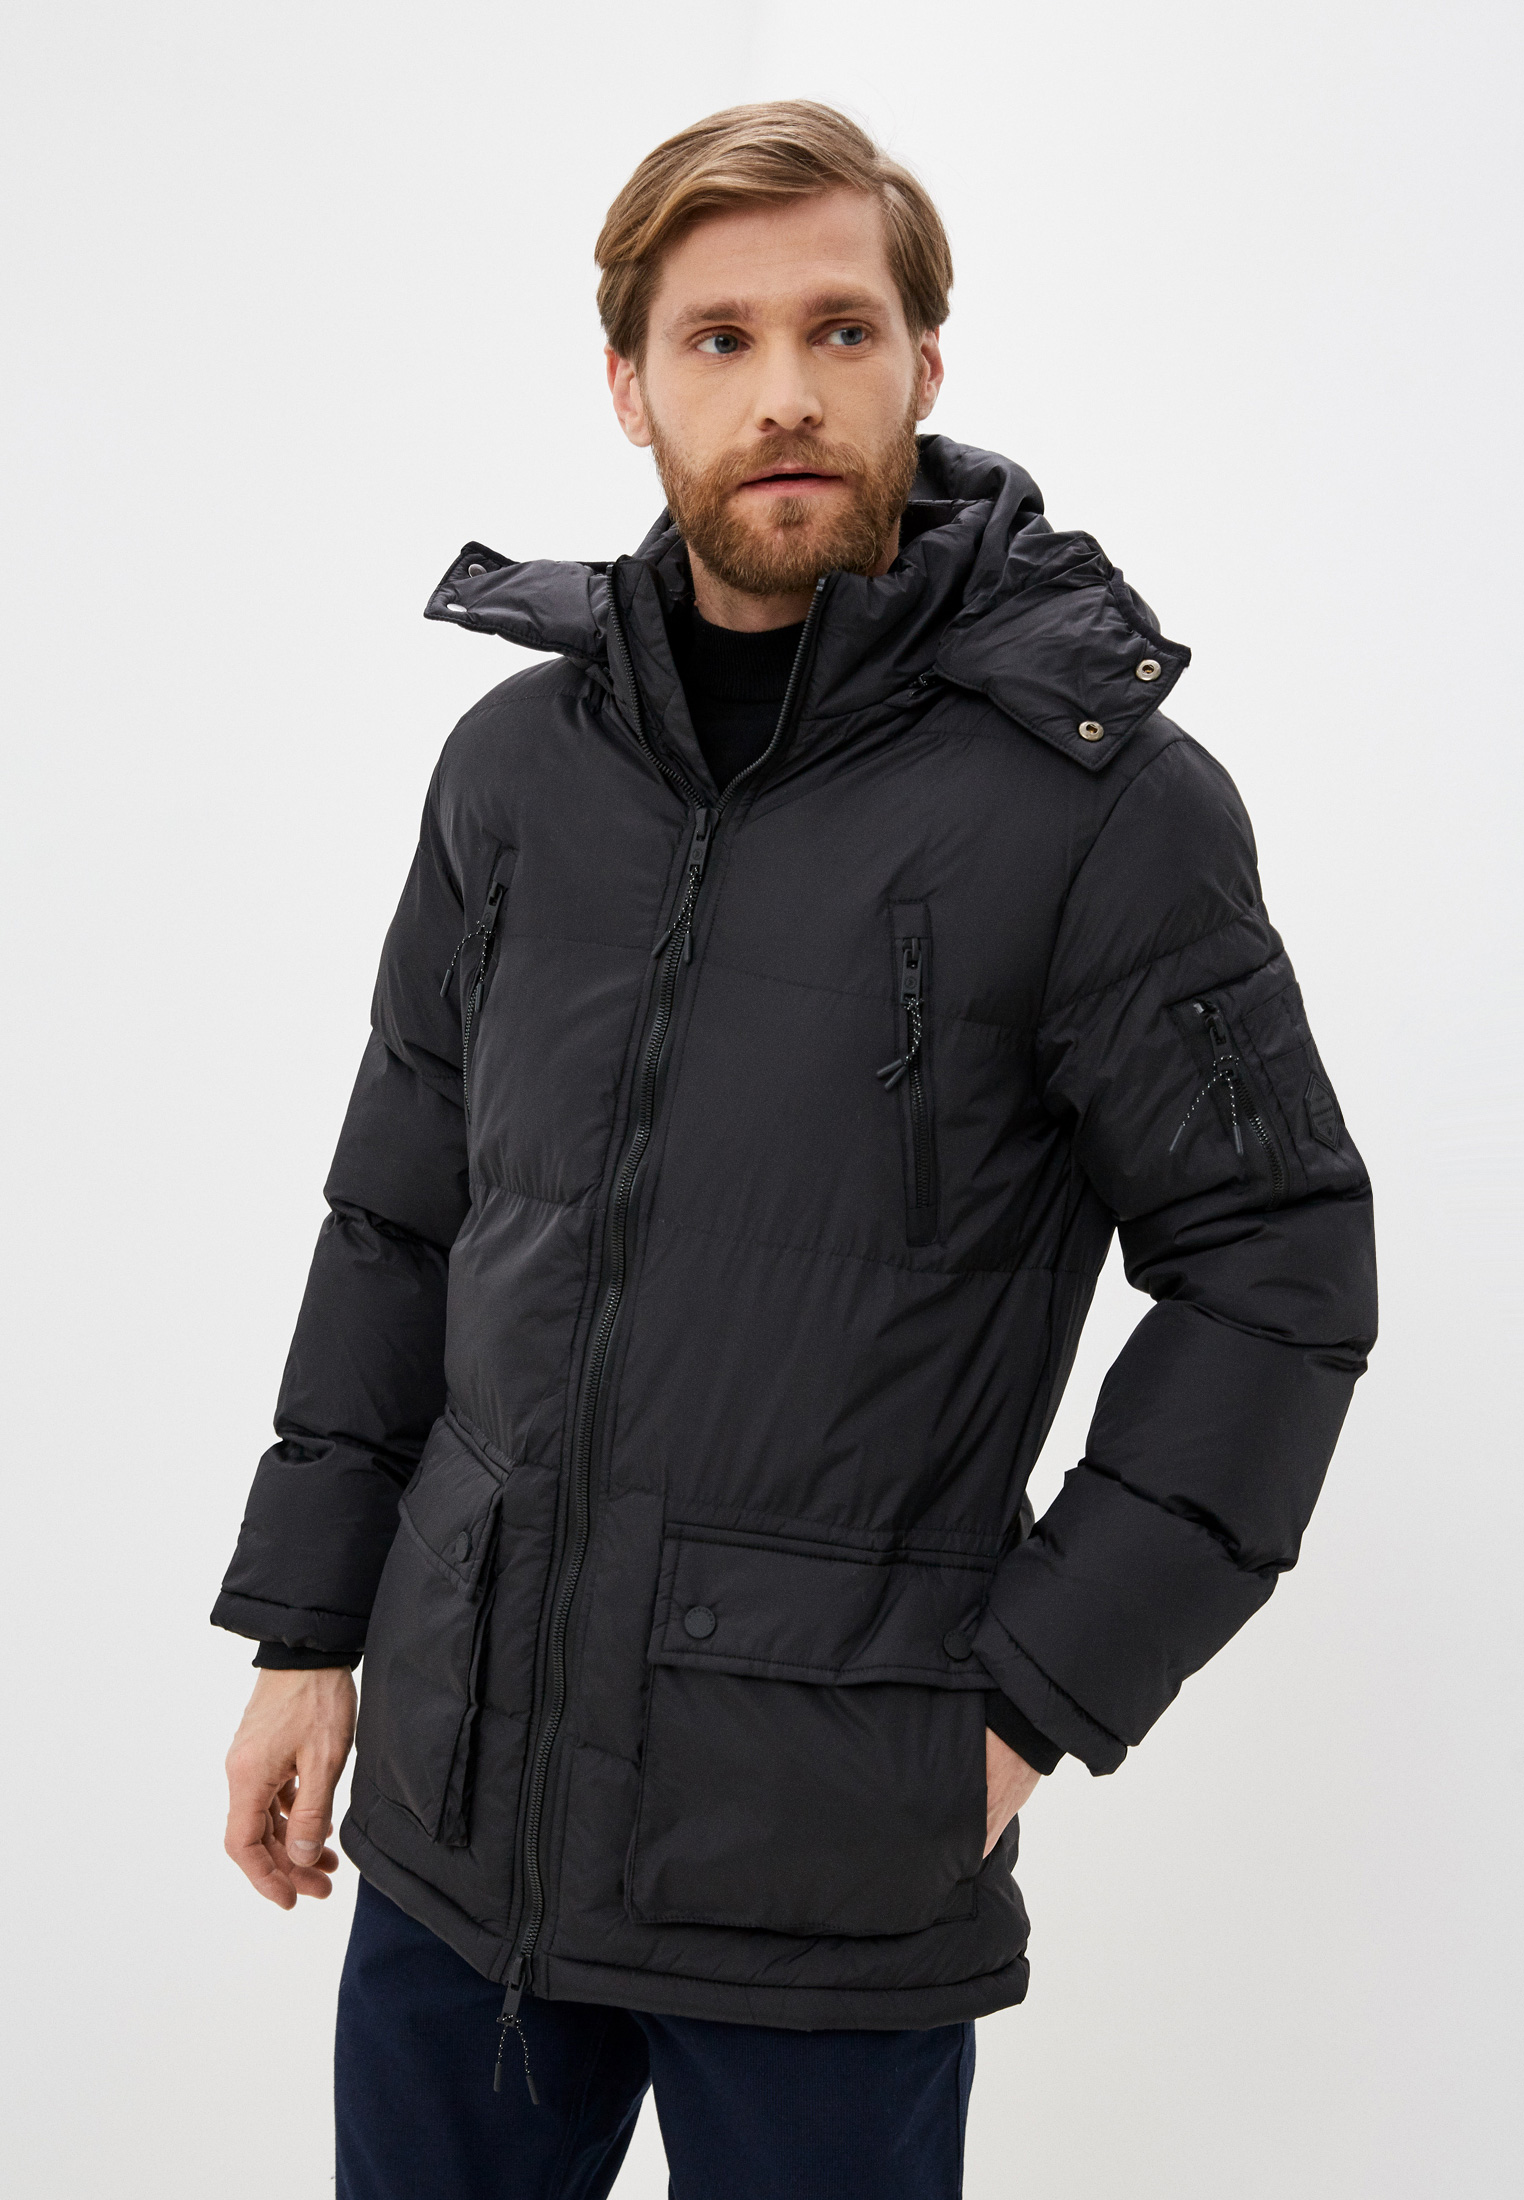 Утепленная куртка DISSIDENT Куртка утепленная Dissident